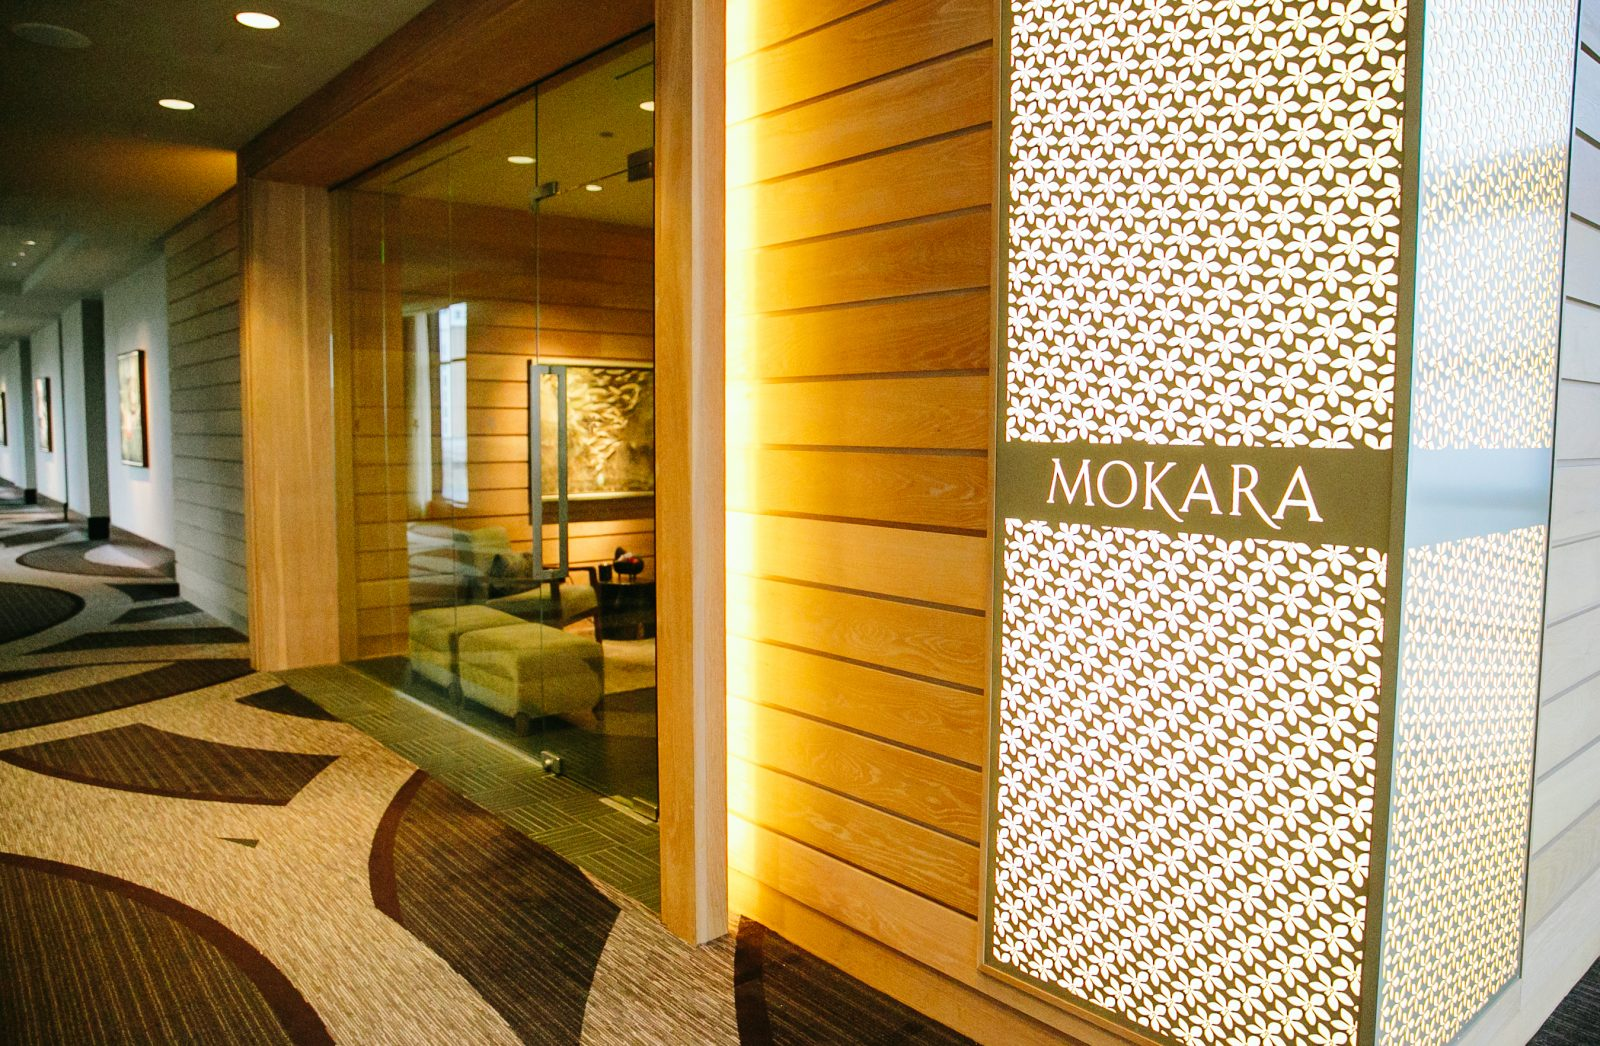 The Mokara luxury spa at the Omni Hotel in Nashville, TN